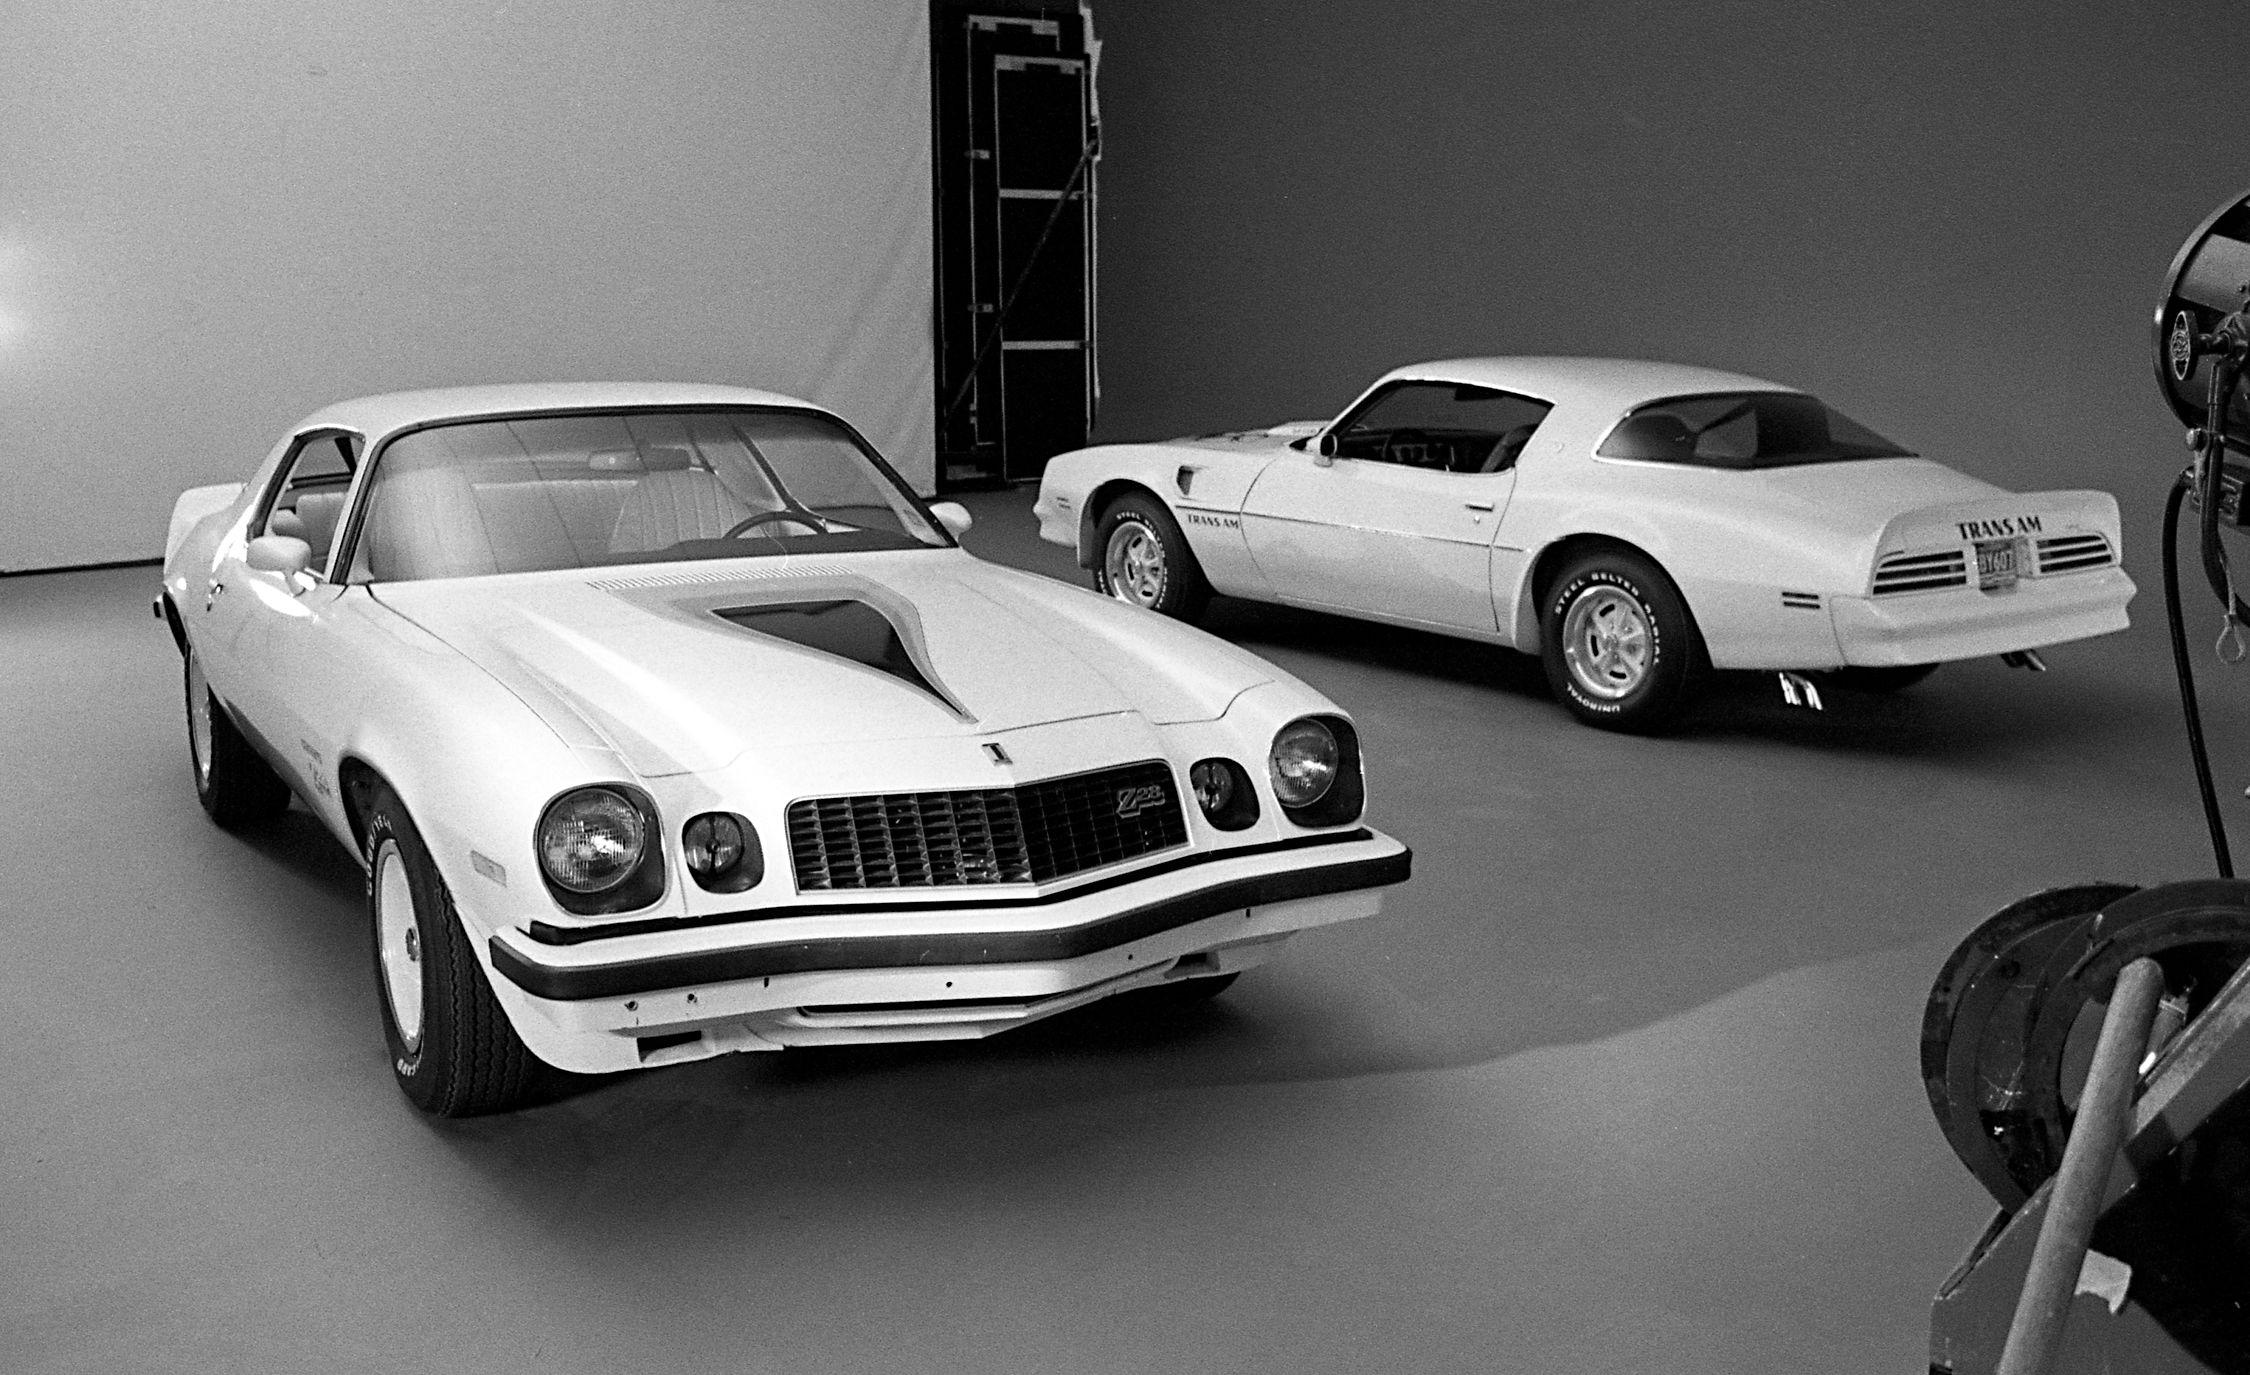 Chevrolet Camaro Z 28 Vs Pontiac Firebird Trans Am Archived